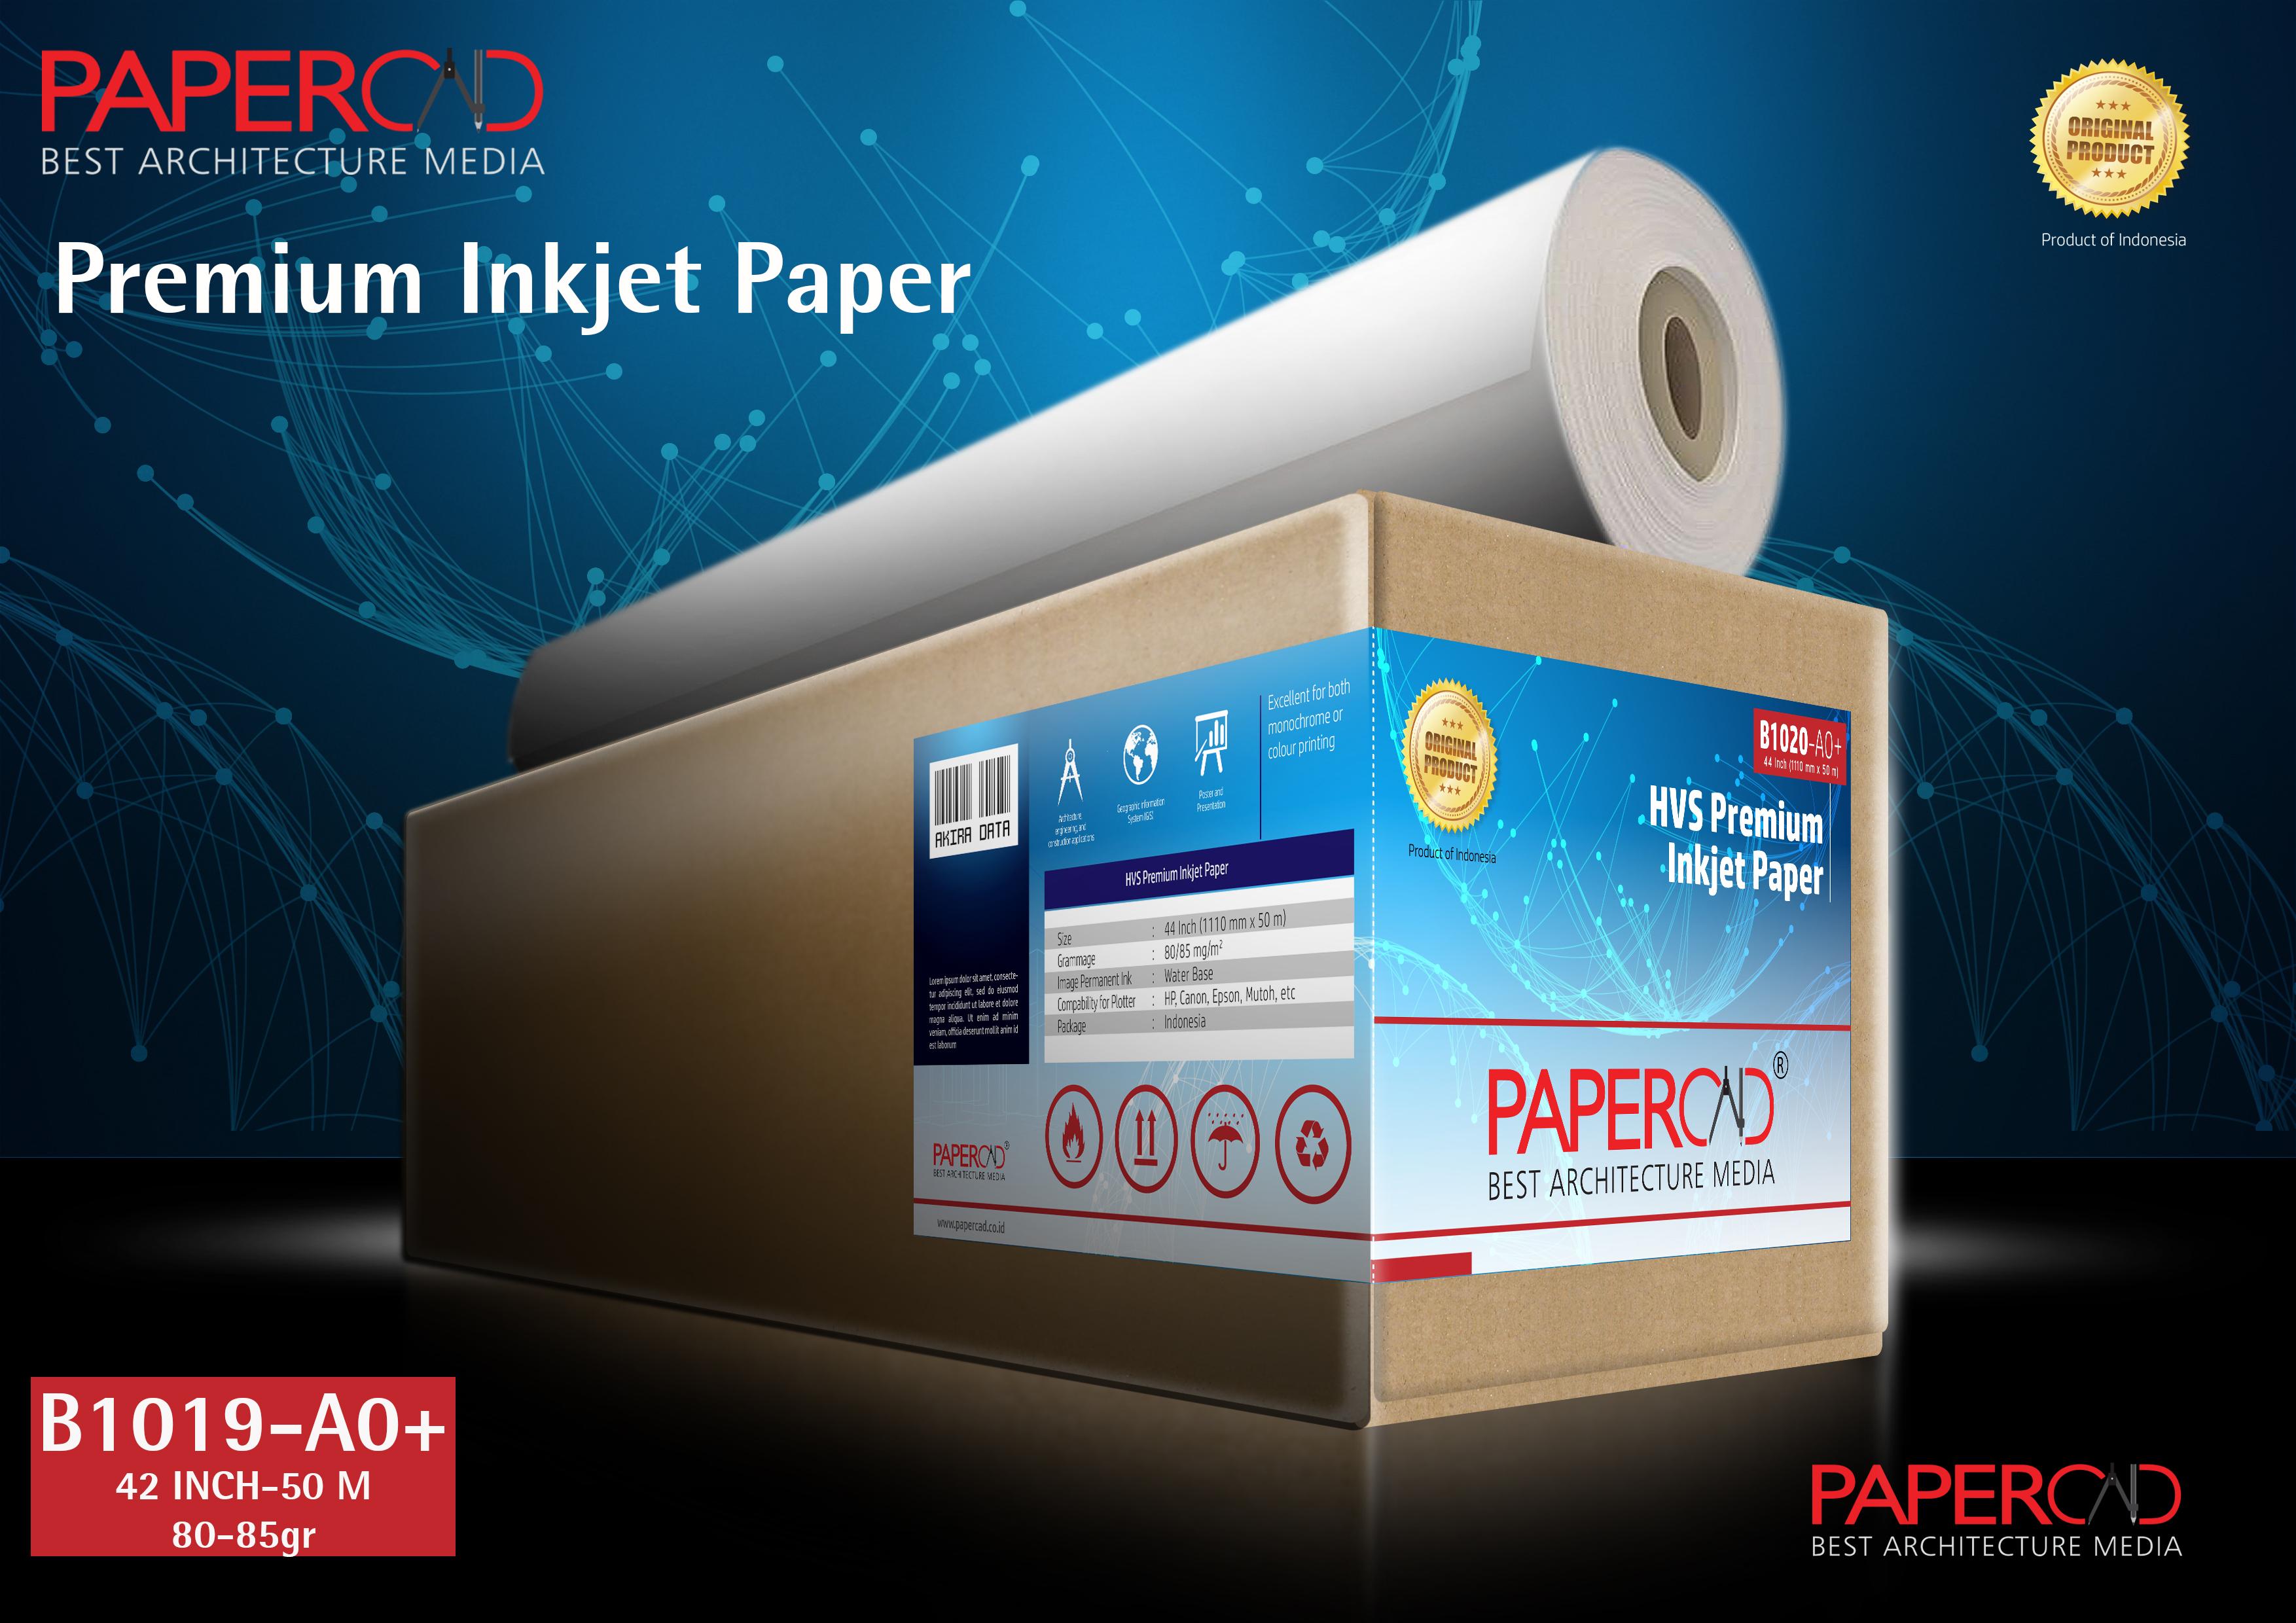 Kertas plotter PAPERCAD Premium Inkjet Paper 80-85gr 42″